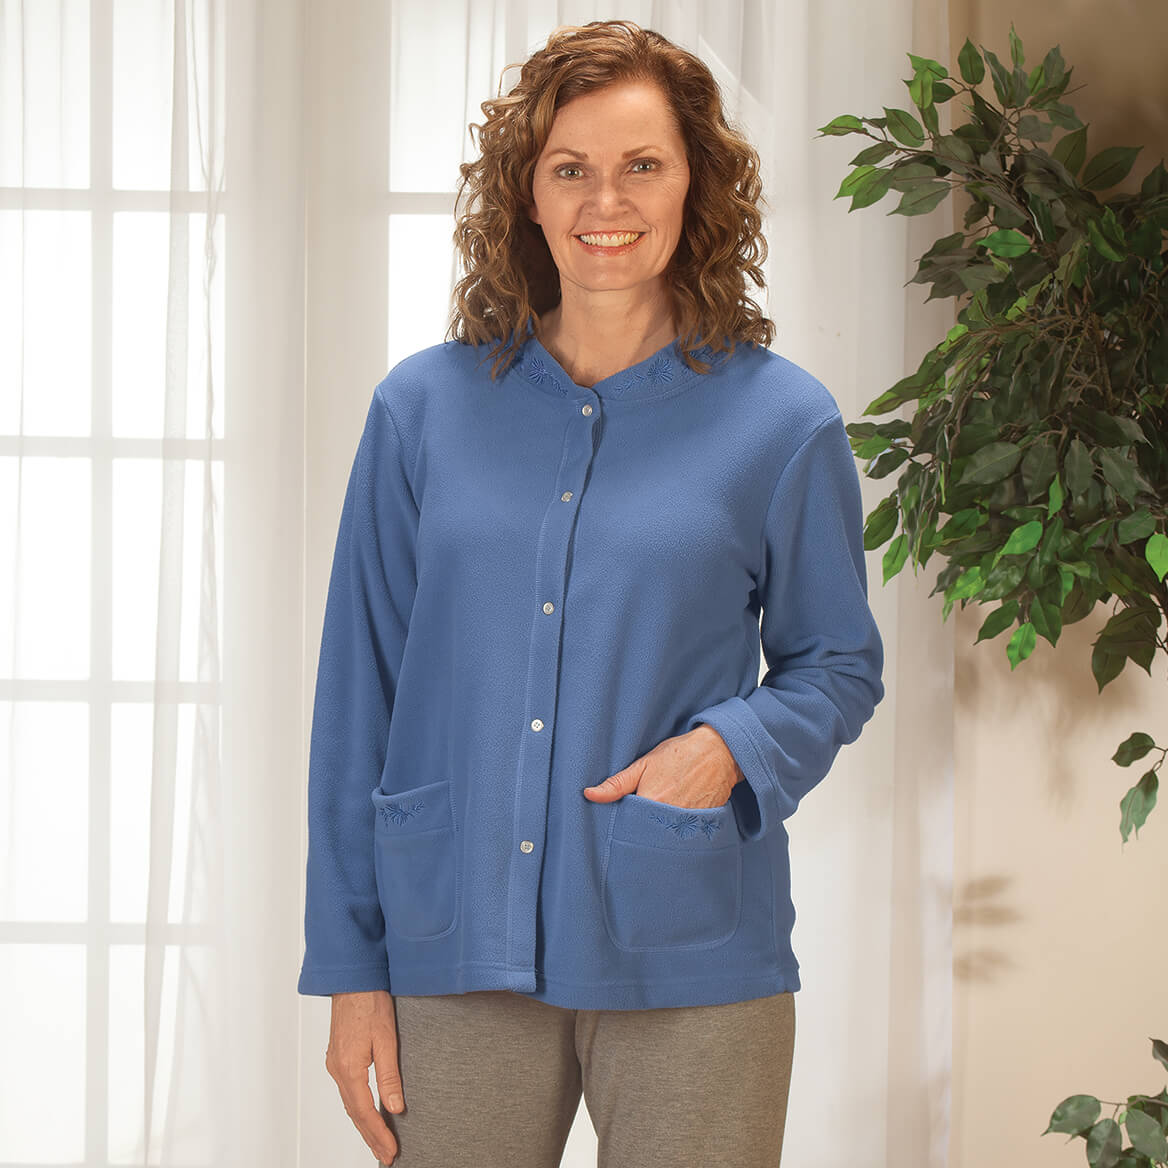 bd46017158b Fleece Bed Jacket - Women s Bed Jacket - Fleece Jacket - Walter Drake